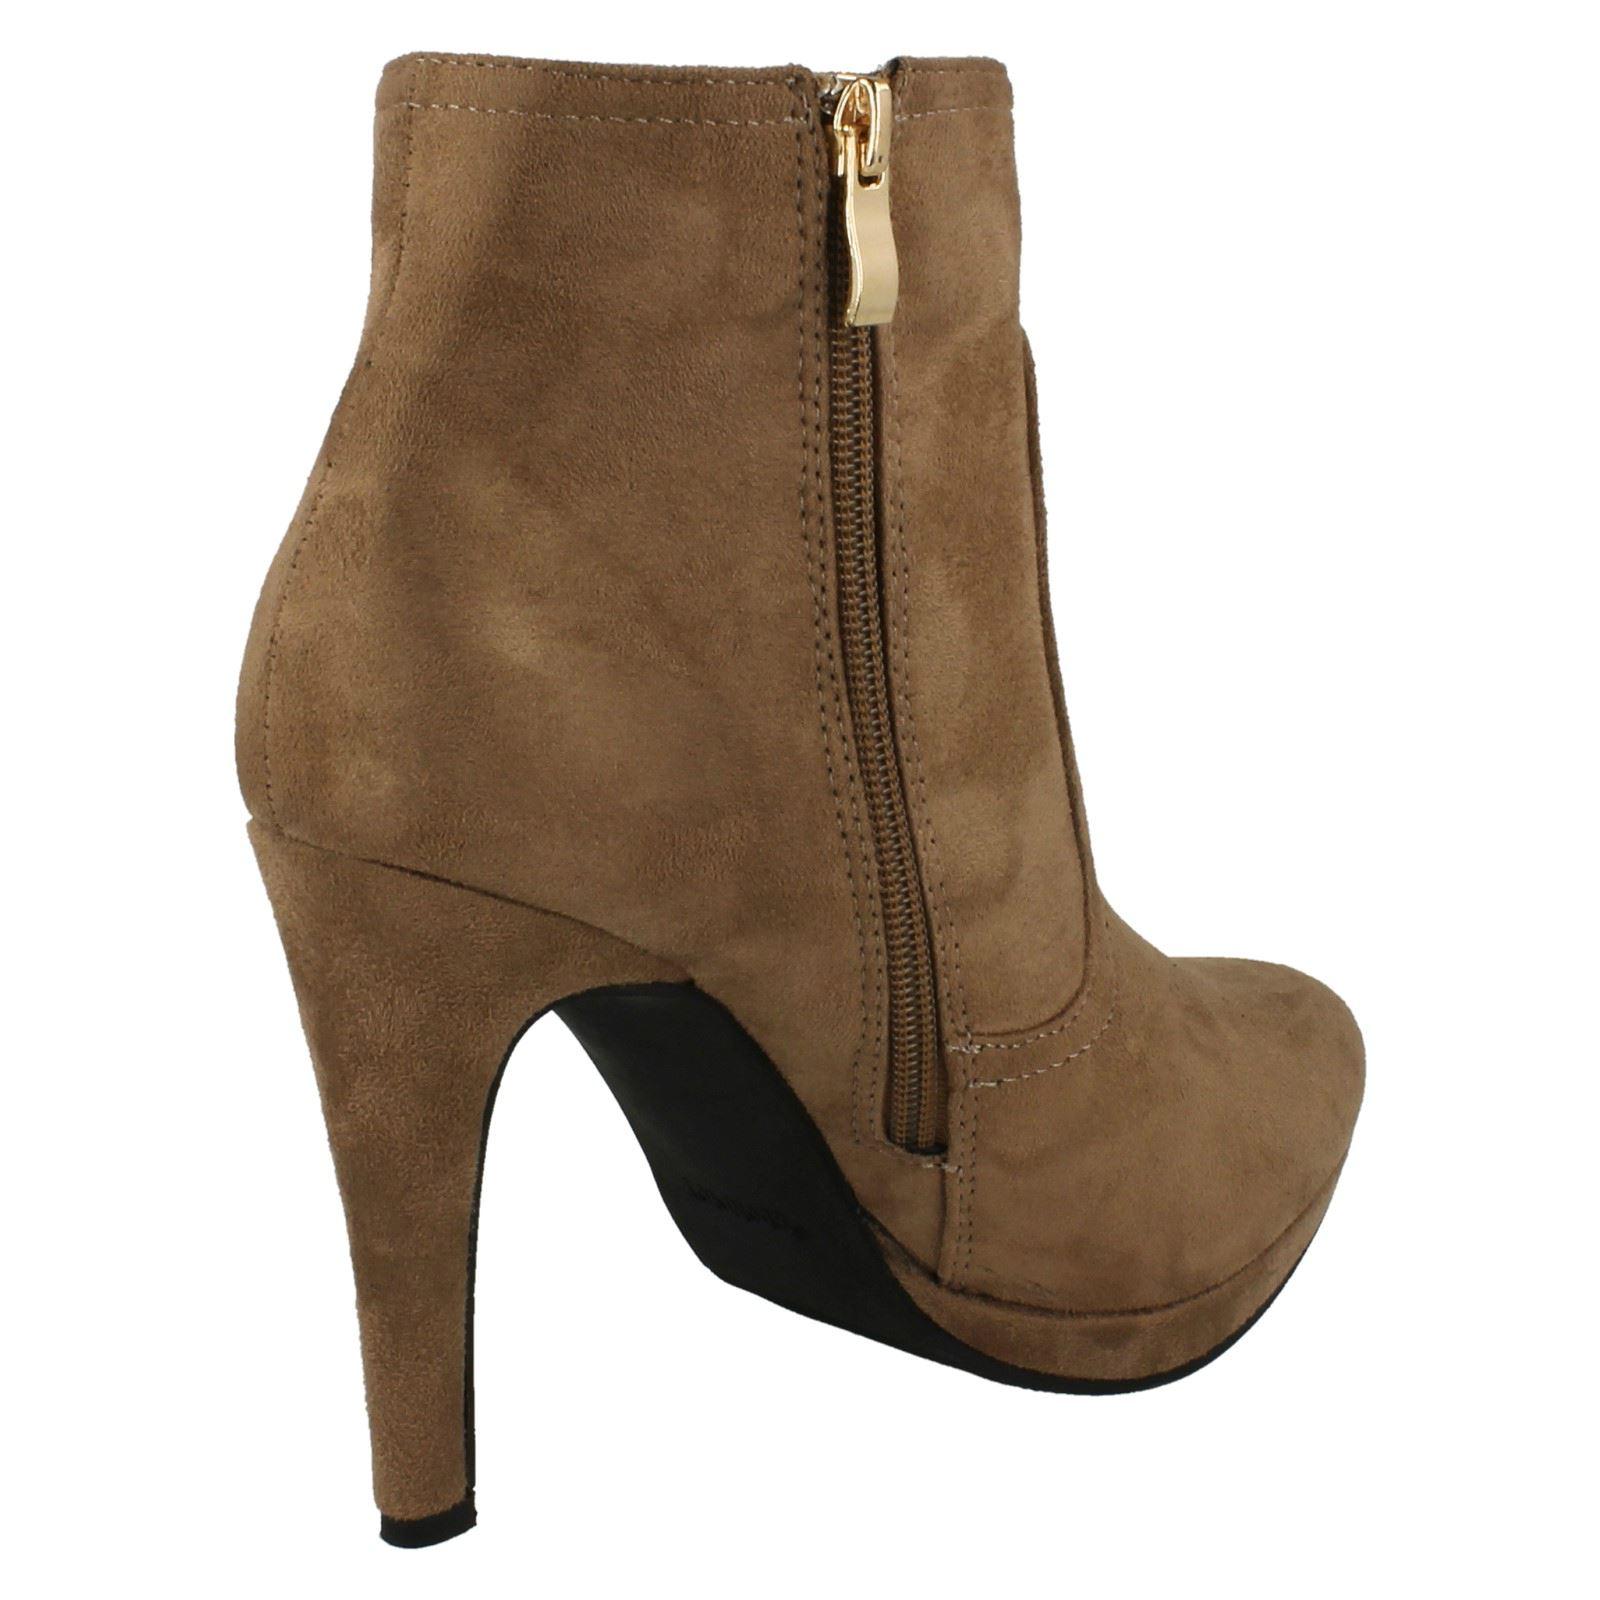 spot on slim heel ankle boots style 679 ebay